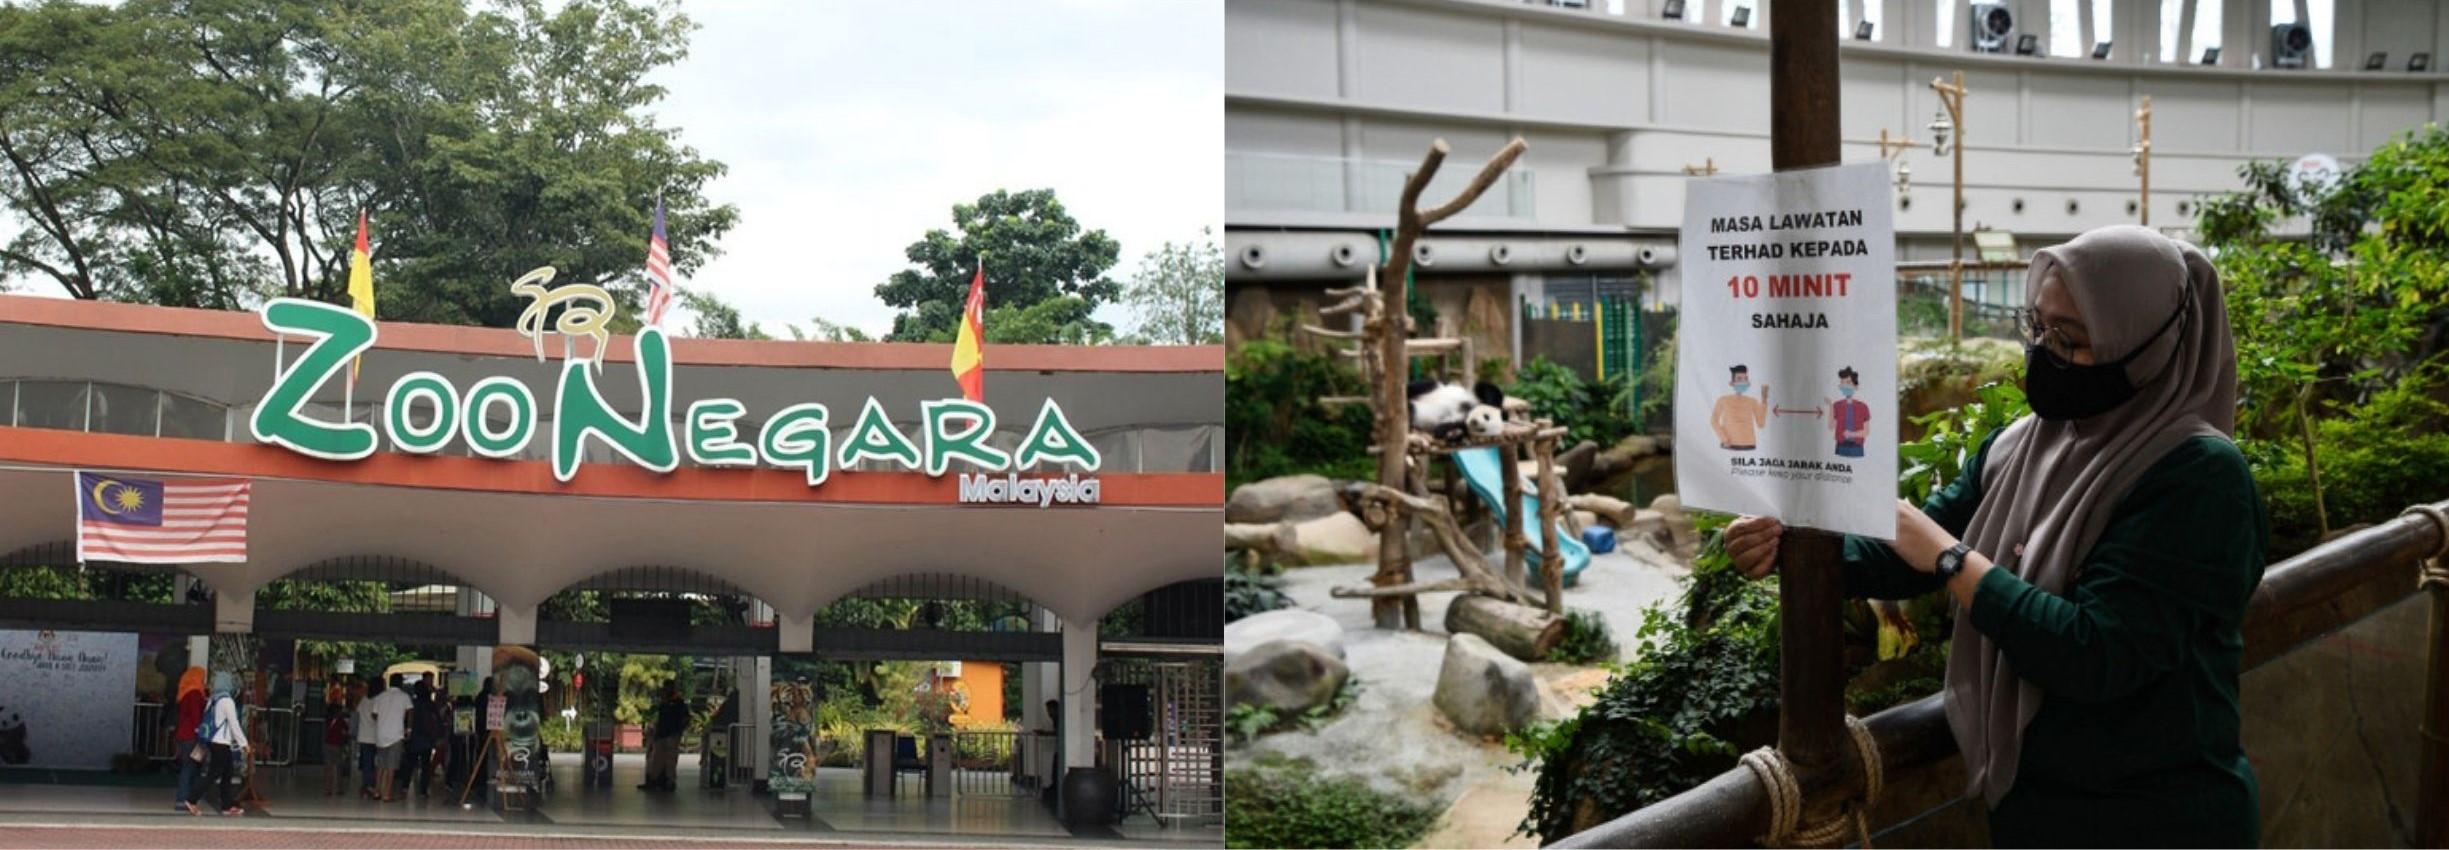 Zoo Negara Reopens Their Doors To Visitors!